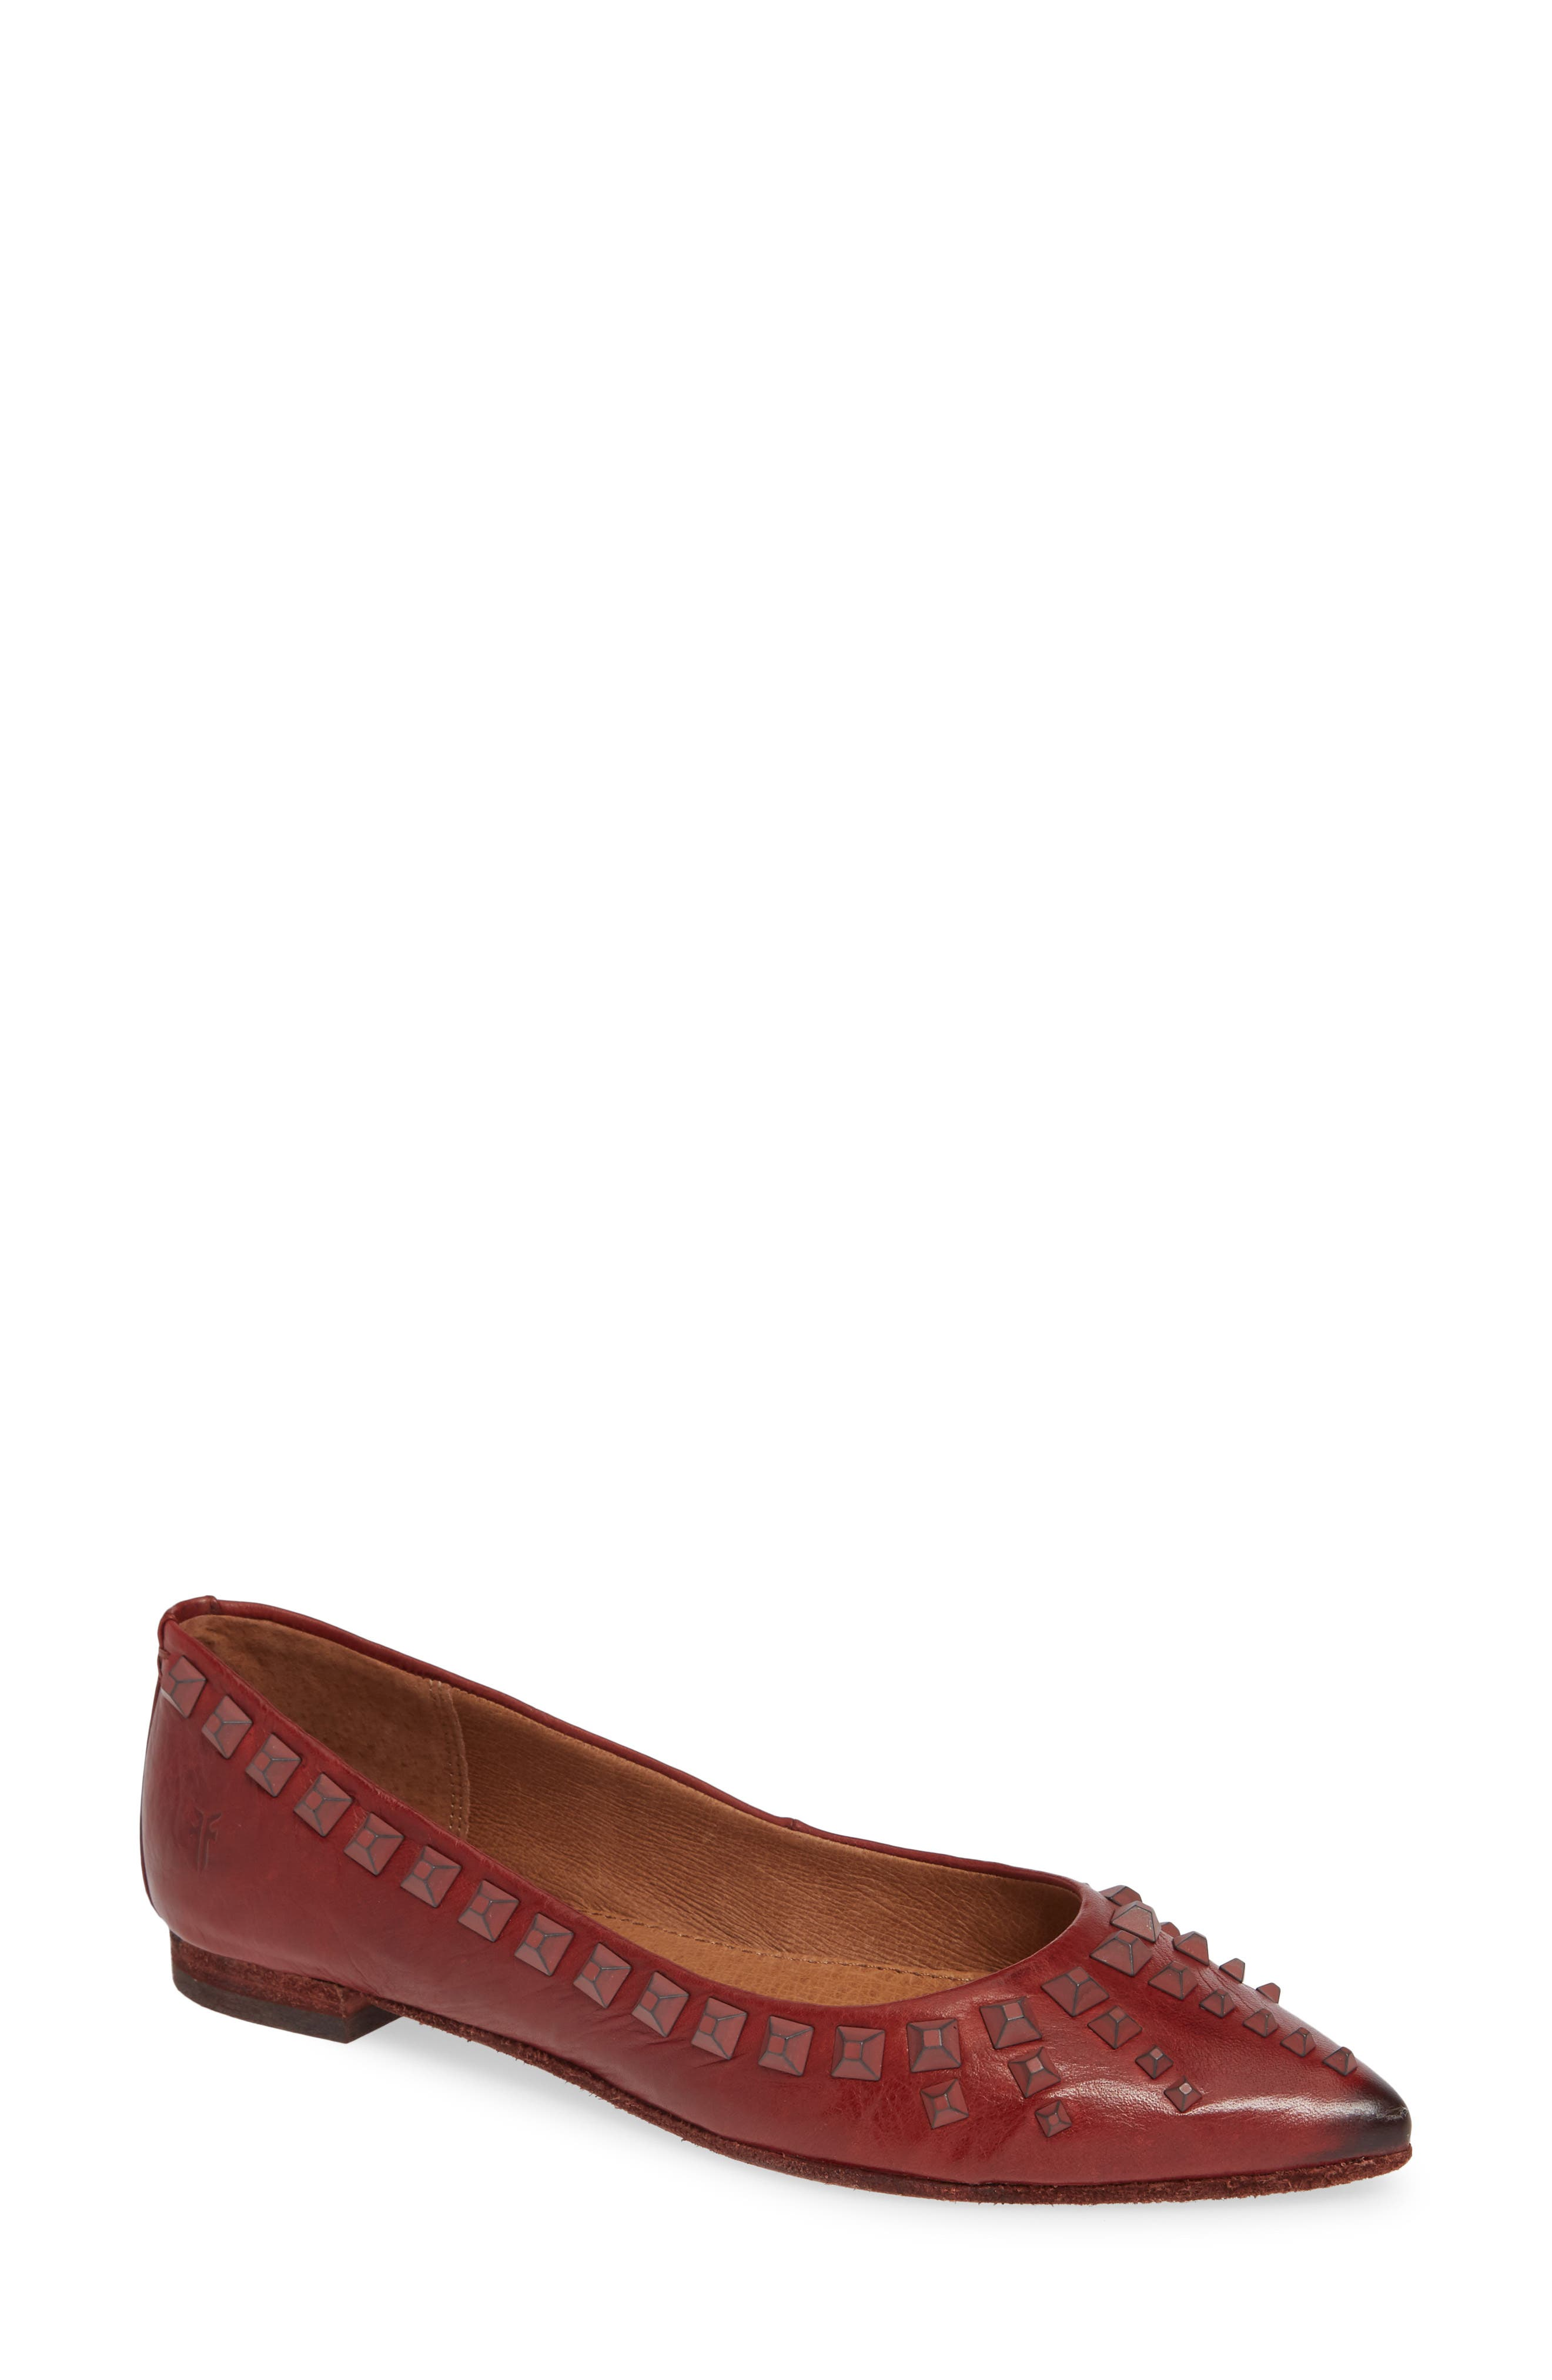 Frye Sienna Deco Stud Ballet Flat, Red